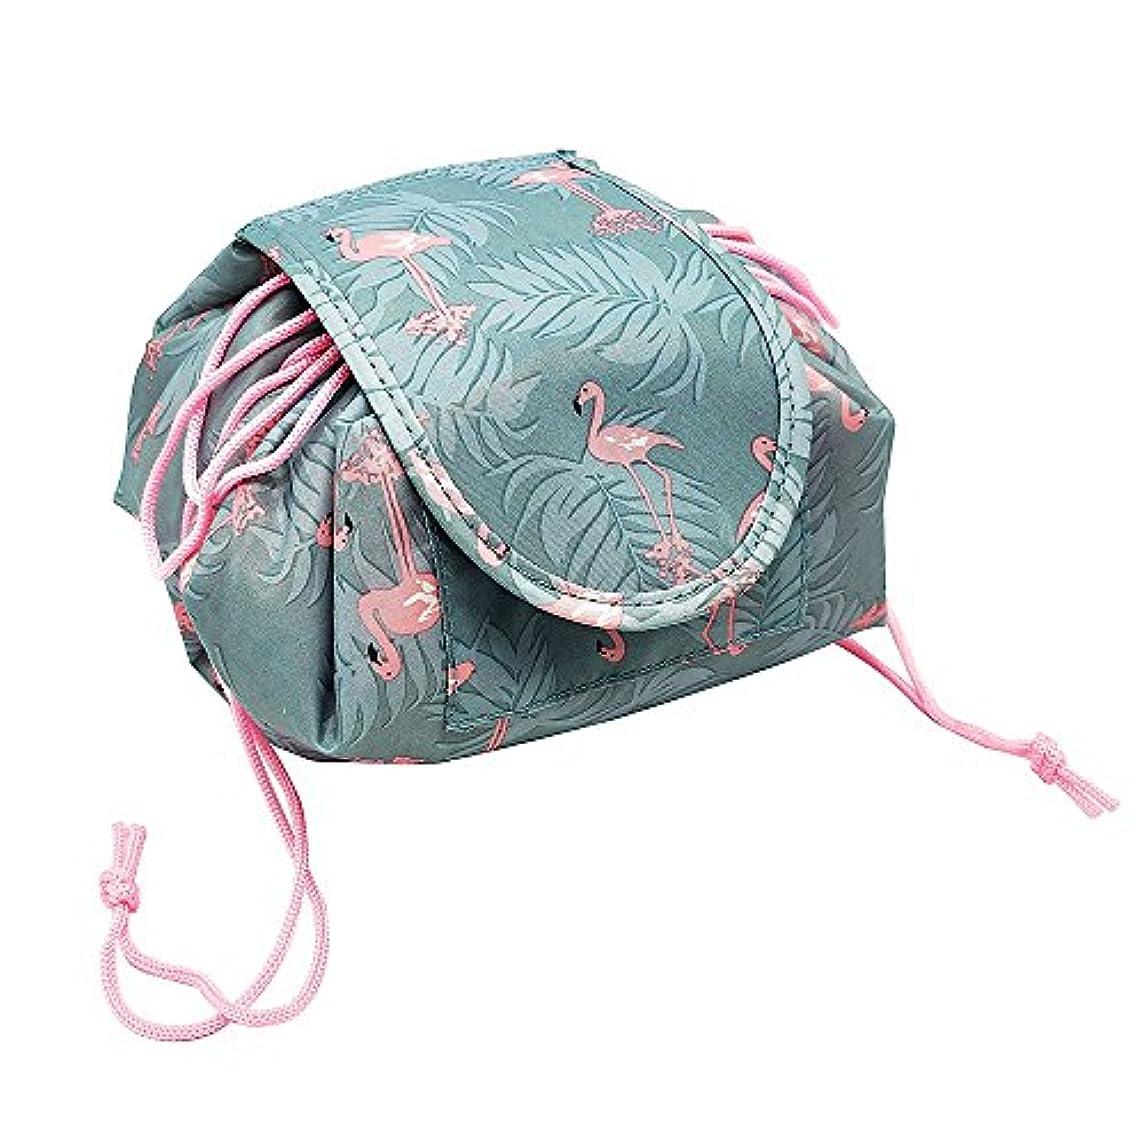 YOE(ヨイ) 化粧ポーチ 巾着型 メイクポーチ 化粧品収納 ボックス メイクバッグ コスメ収納 ポーチ レディース (フリーサイズ, フラミンゴ)